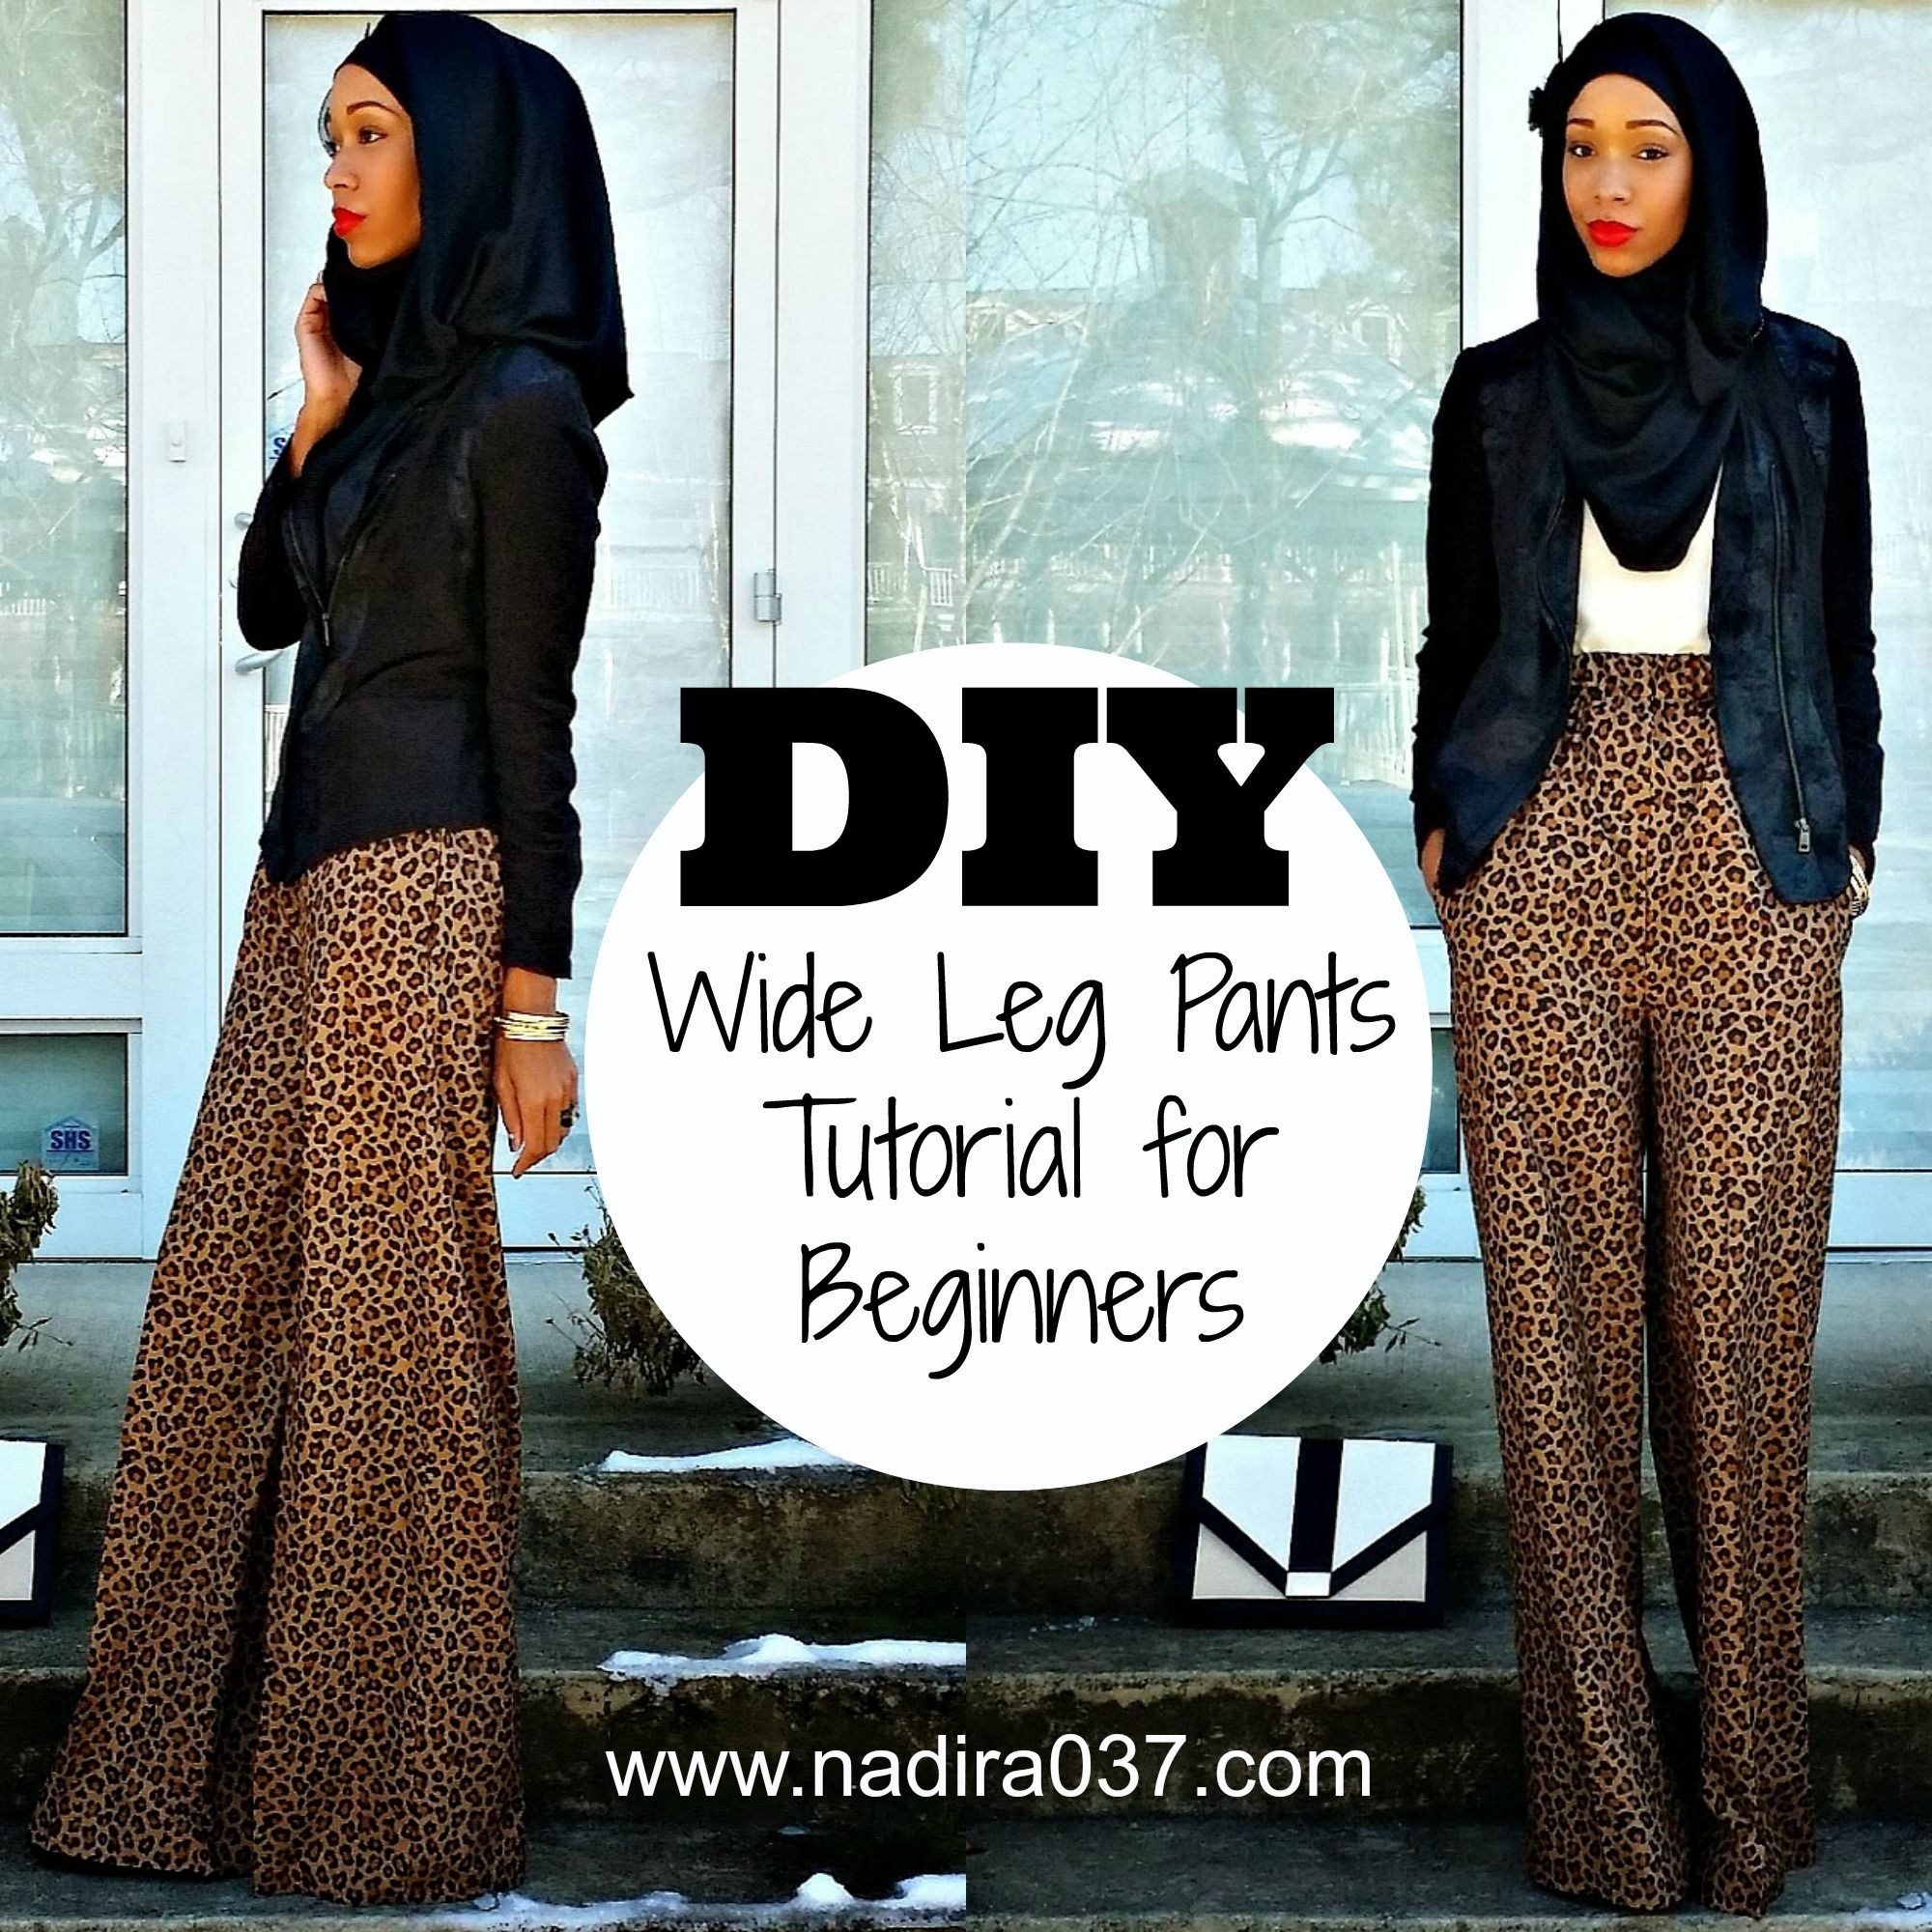 Diy Nadira037 Super Easy Wide Leg Pants Tutorial For Beginners